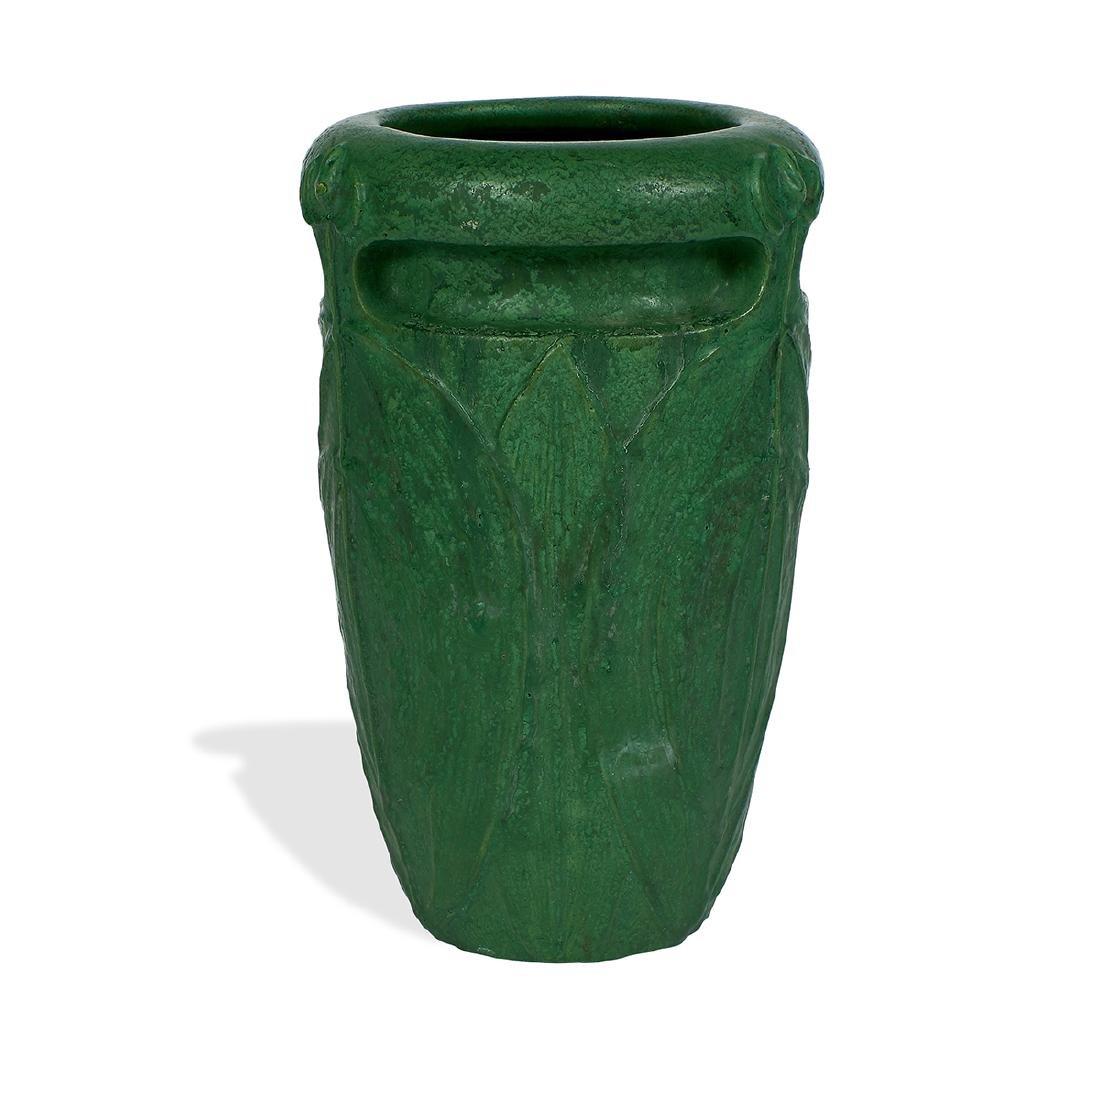 Wheatley Pottery Company, Stylized Foliate Vase - 2